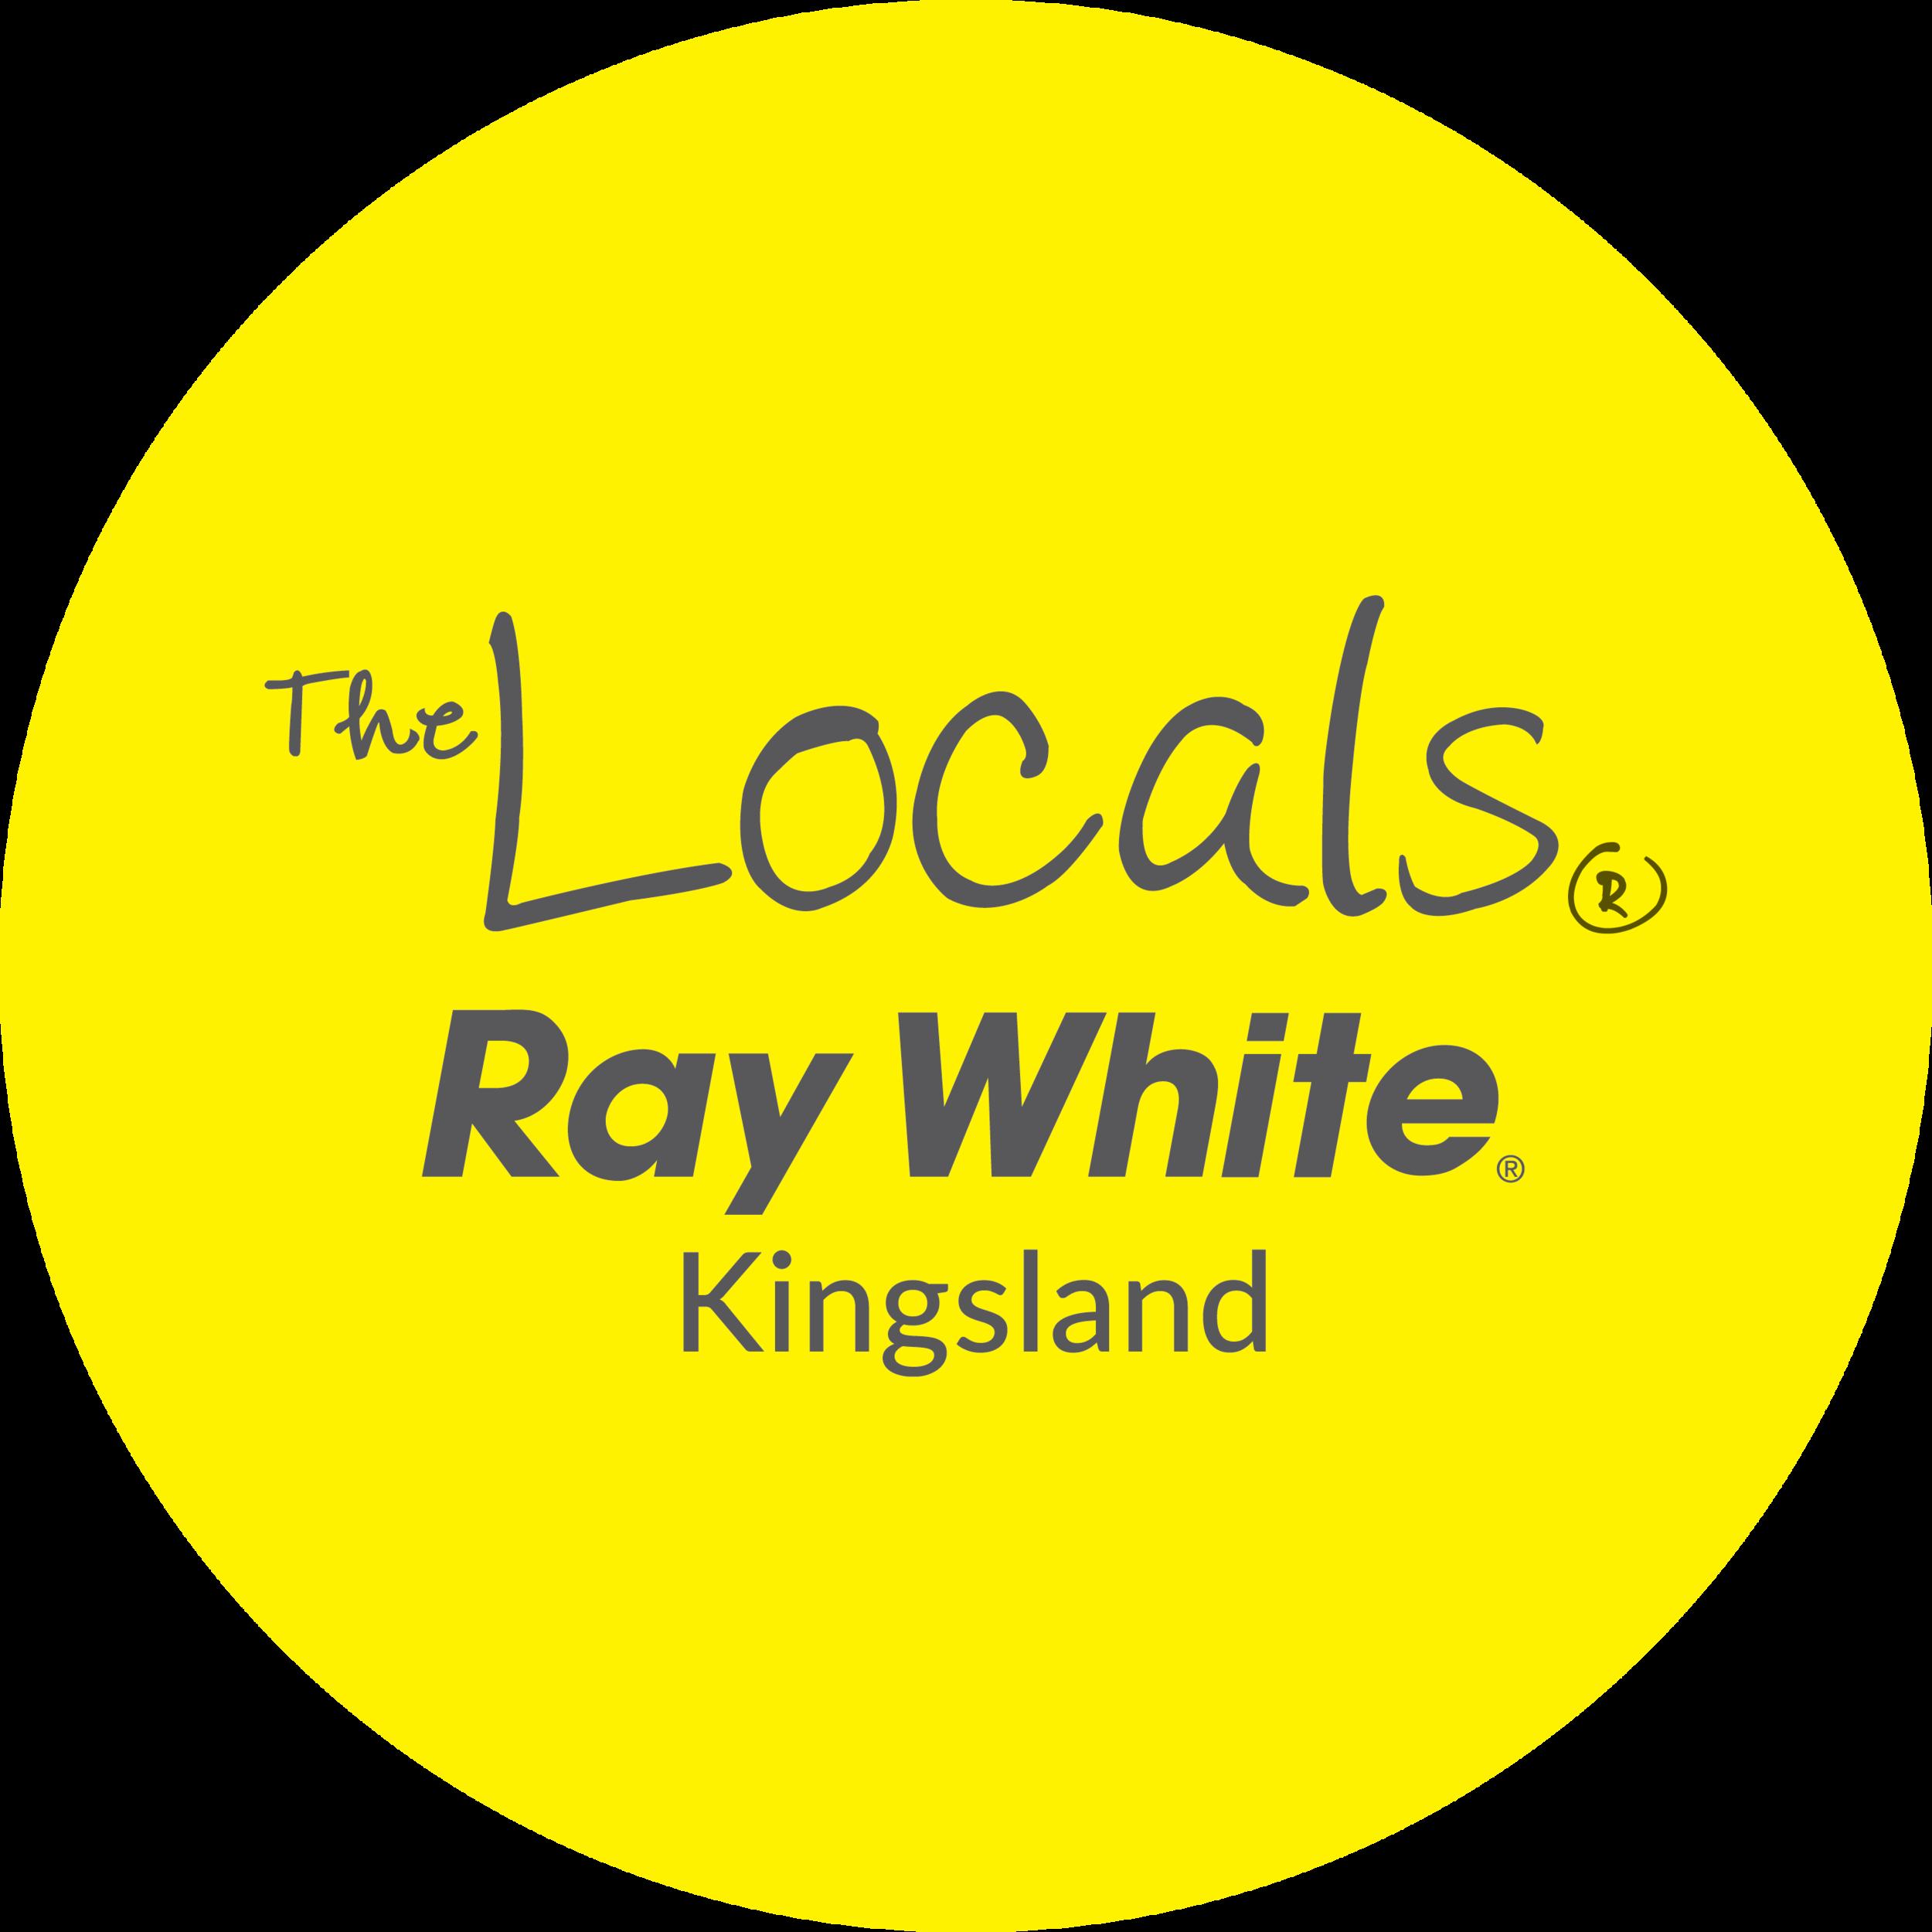 The Locals - Ray White - KingslandSponsors 2018